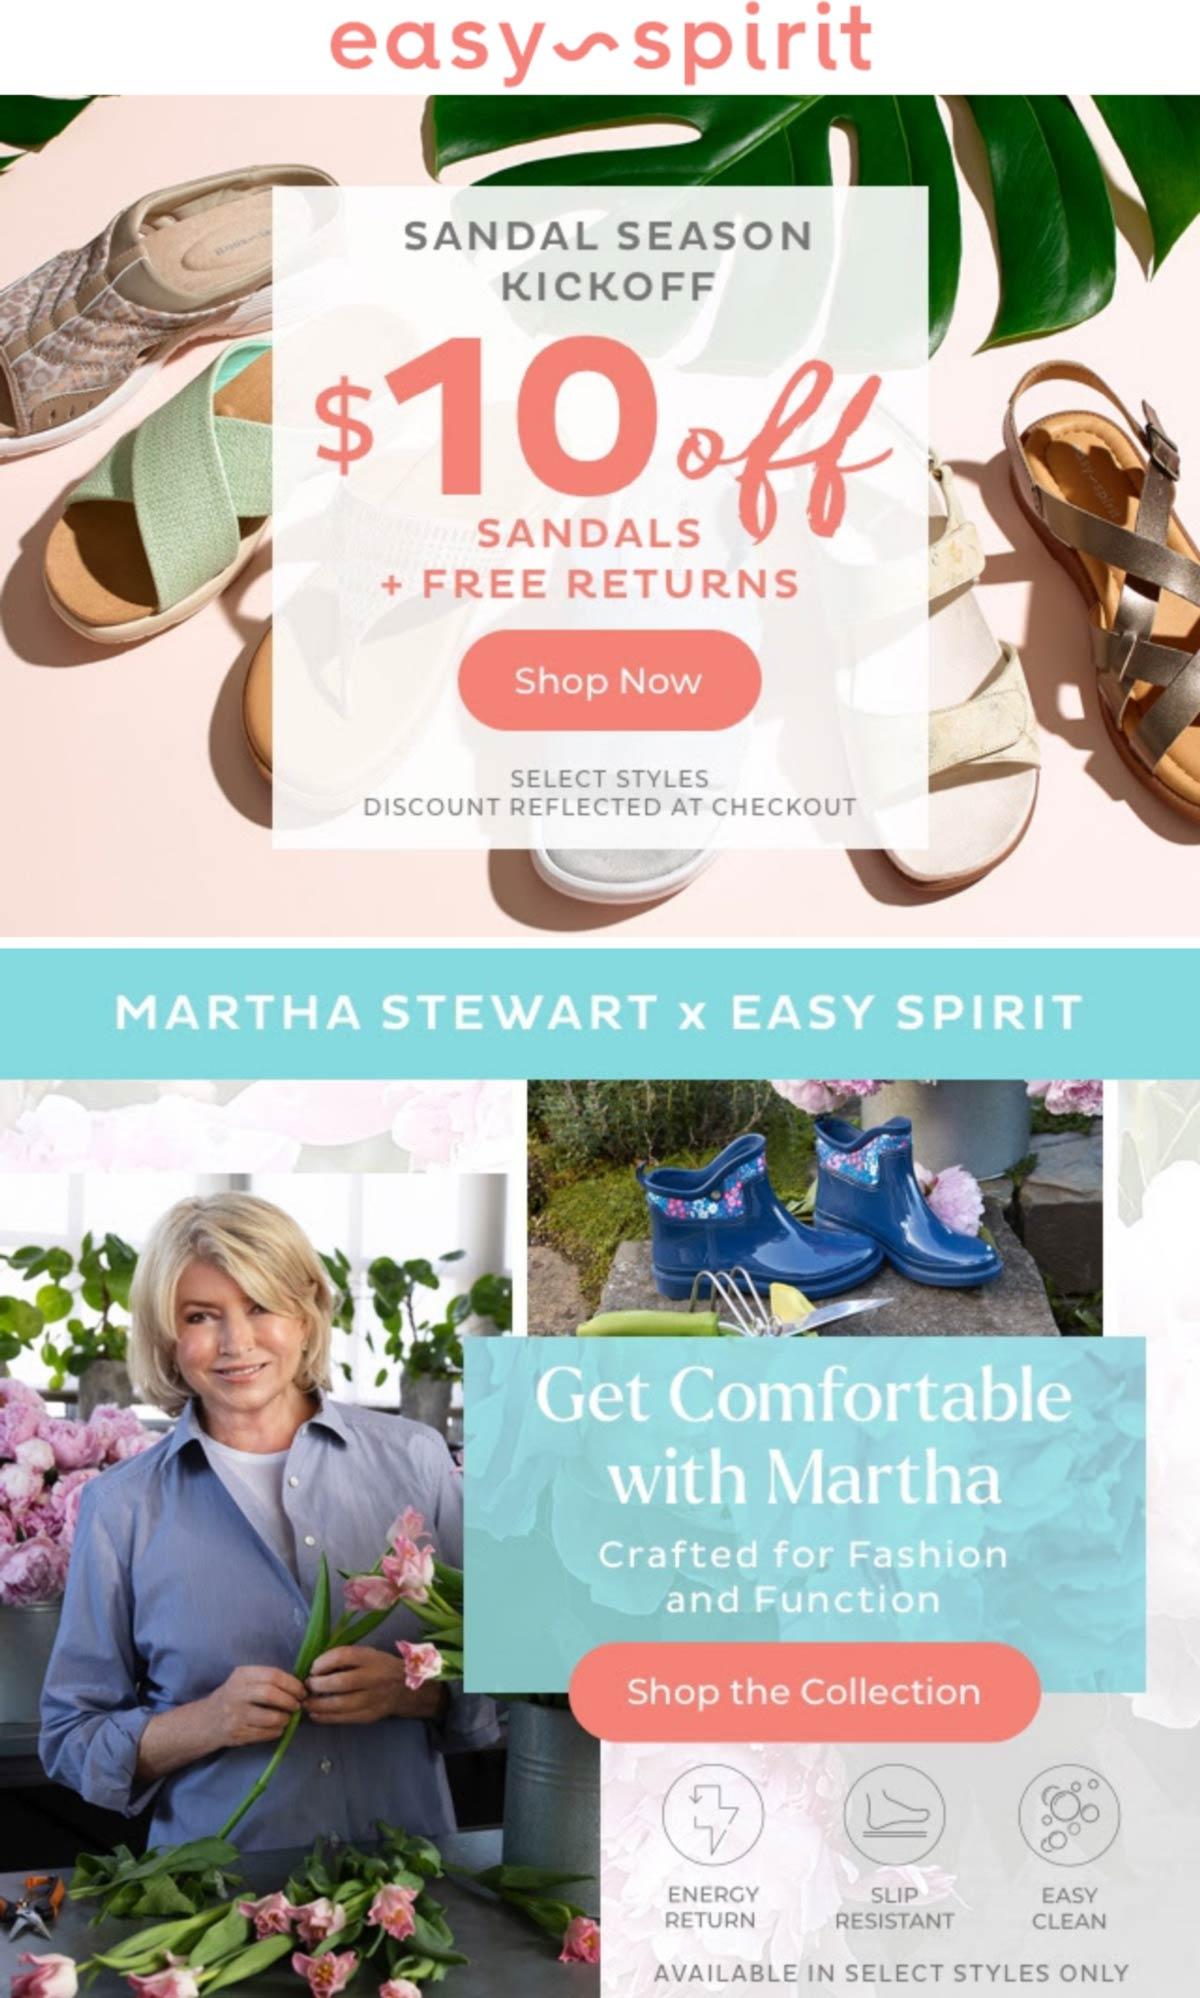 Easy Spirit stores Coupon  $10 off sandals at Easy Spirit #easyspirit